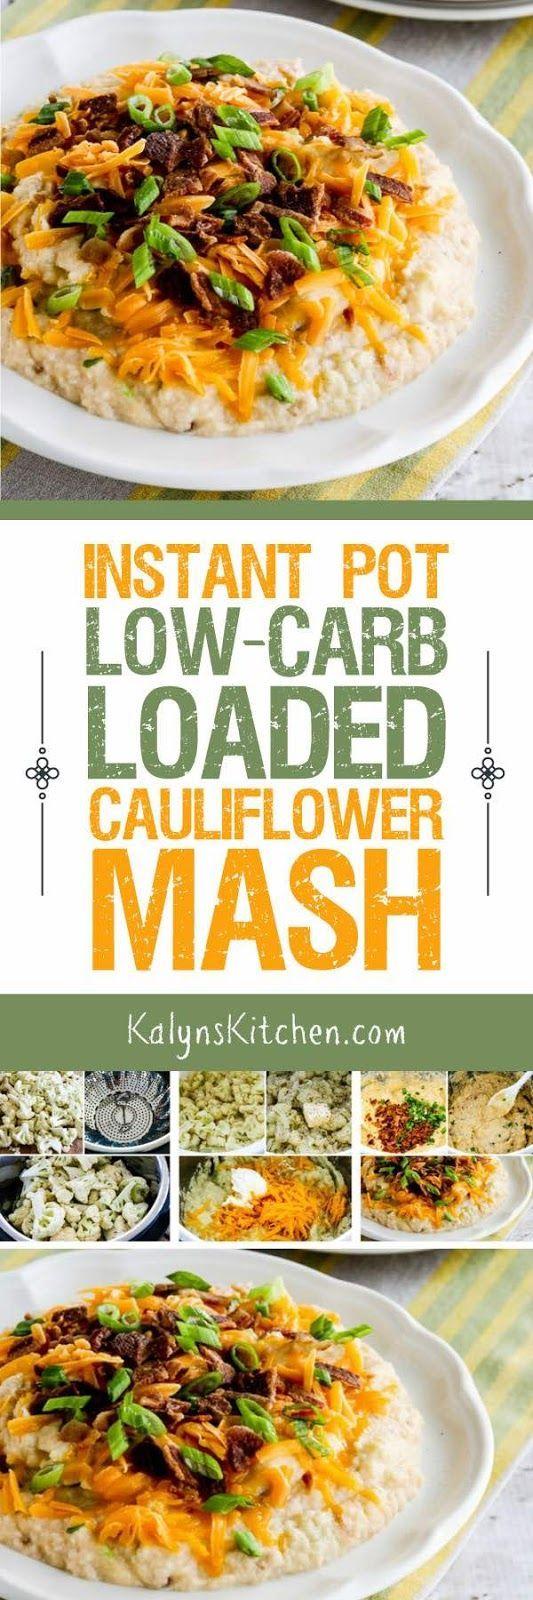 Blue apron low carb - Instant Pot Or Stovetop Low Carb Loaded Cauliflower Mash